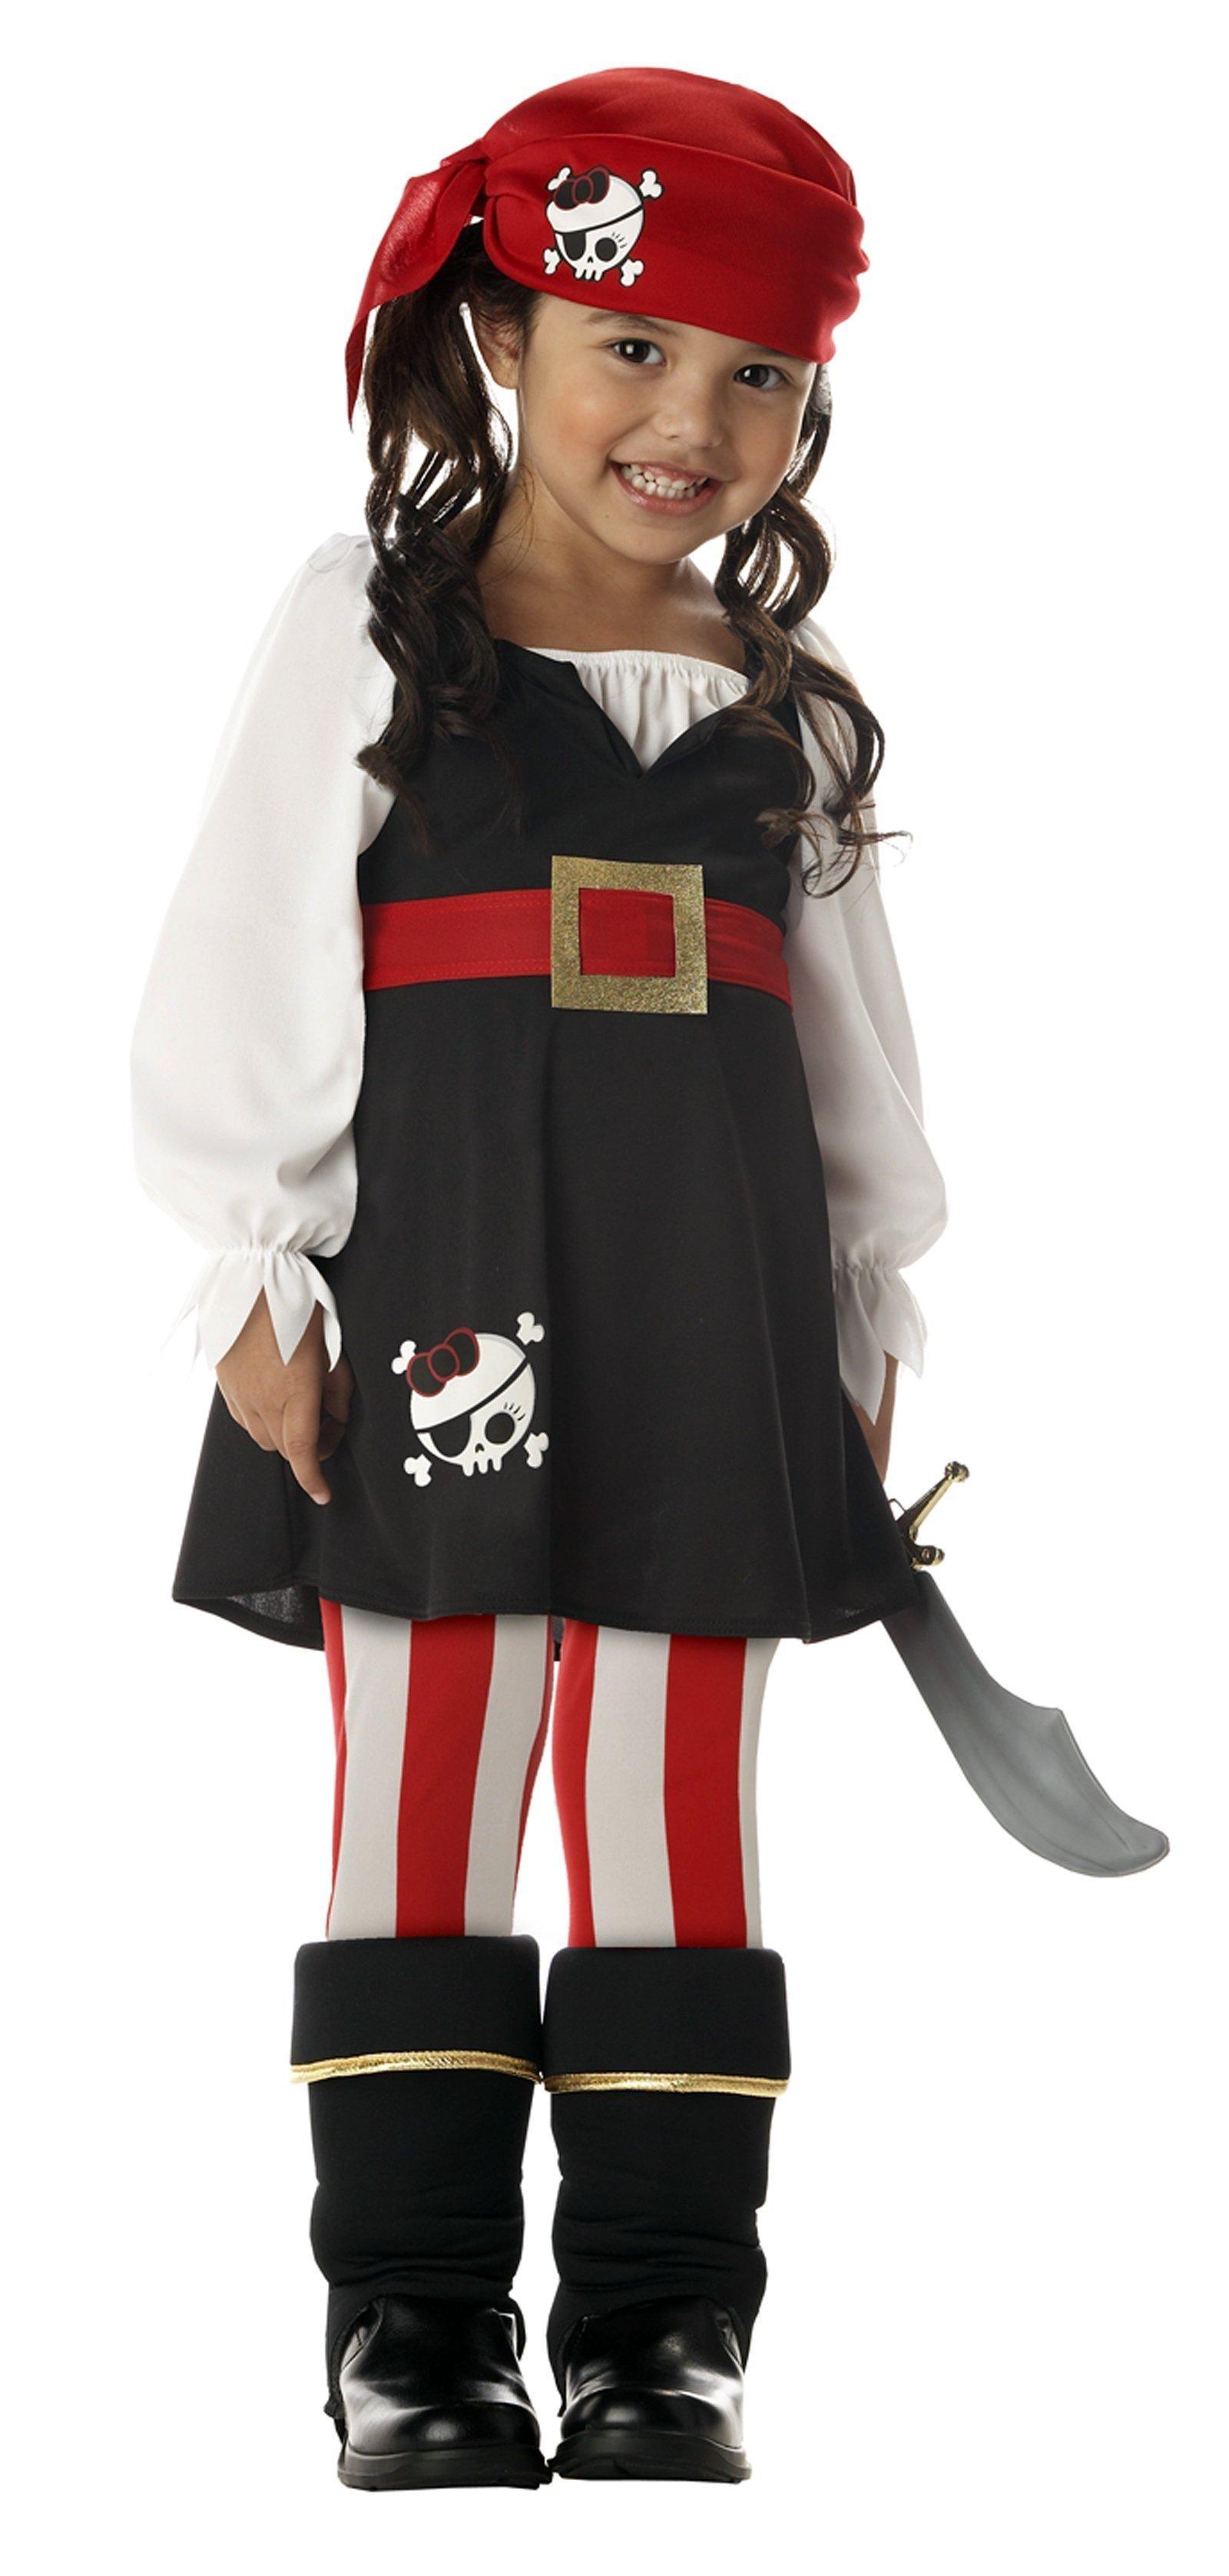 Precious Little Pirate Toddler Costume In